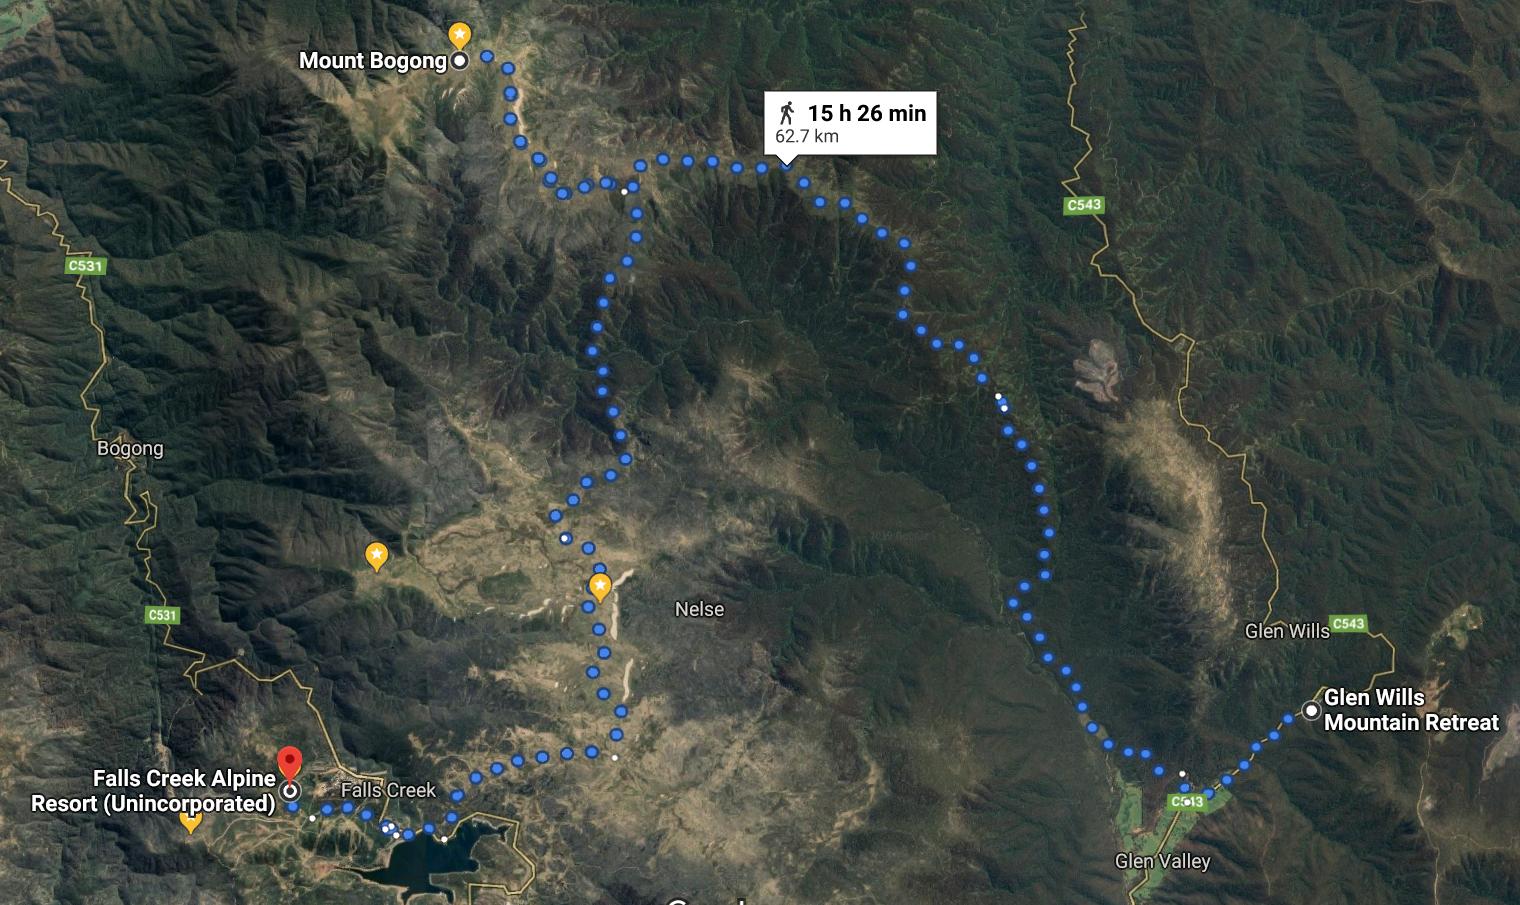 10 Glen Wills to Falls Creek 60kms via Bogong